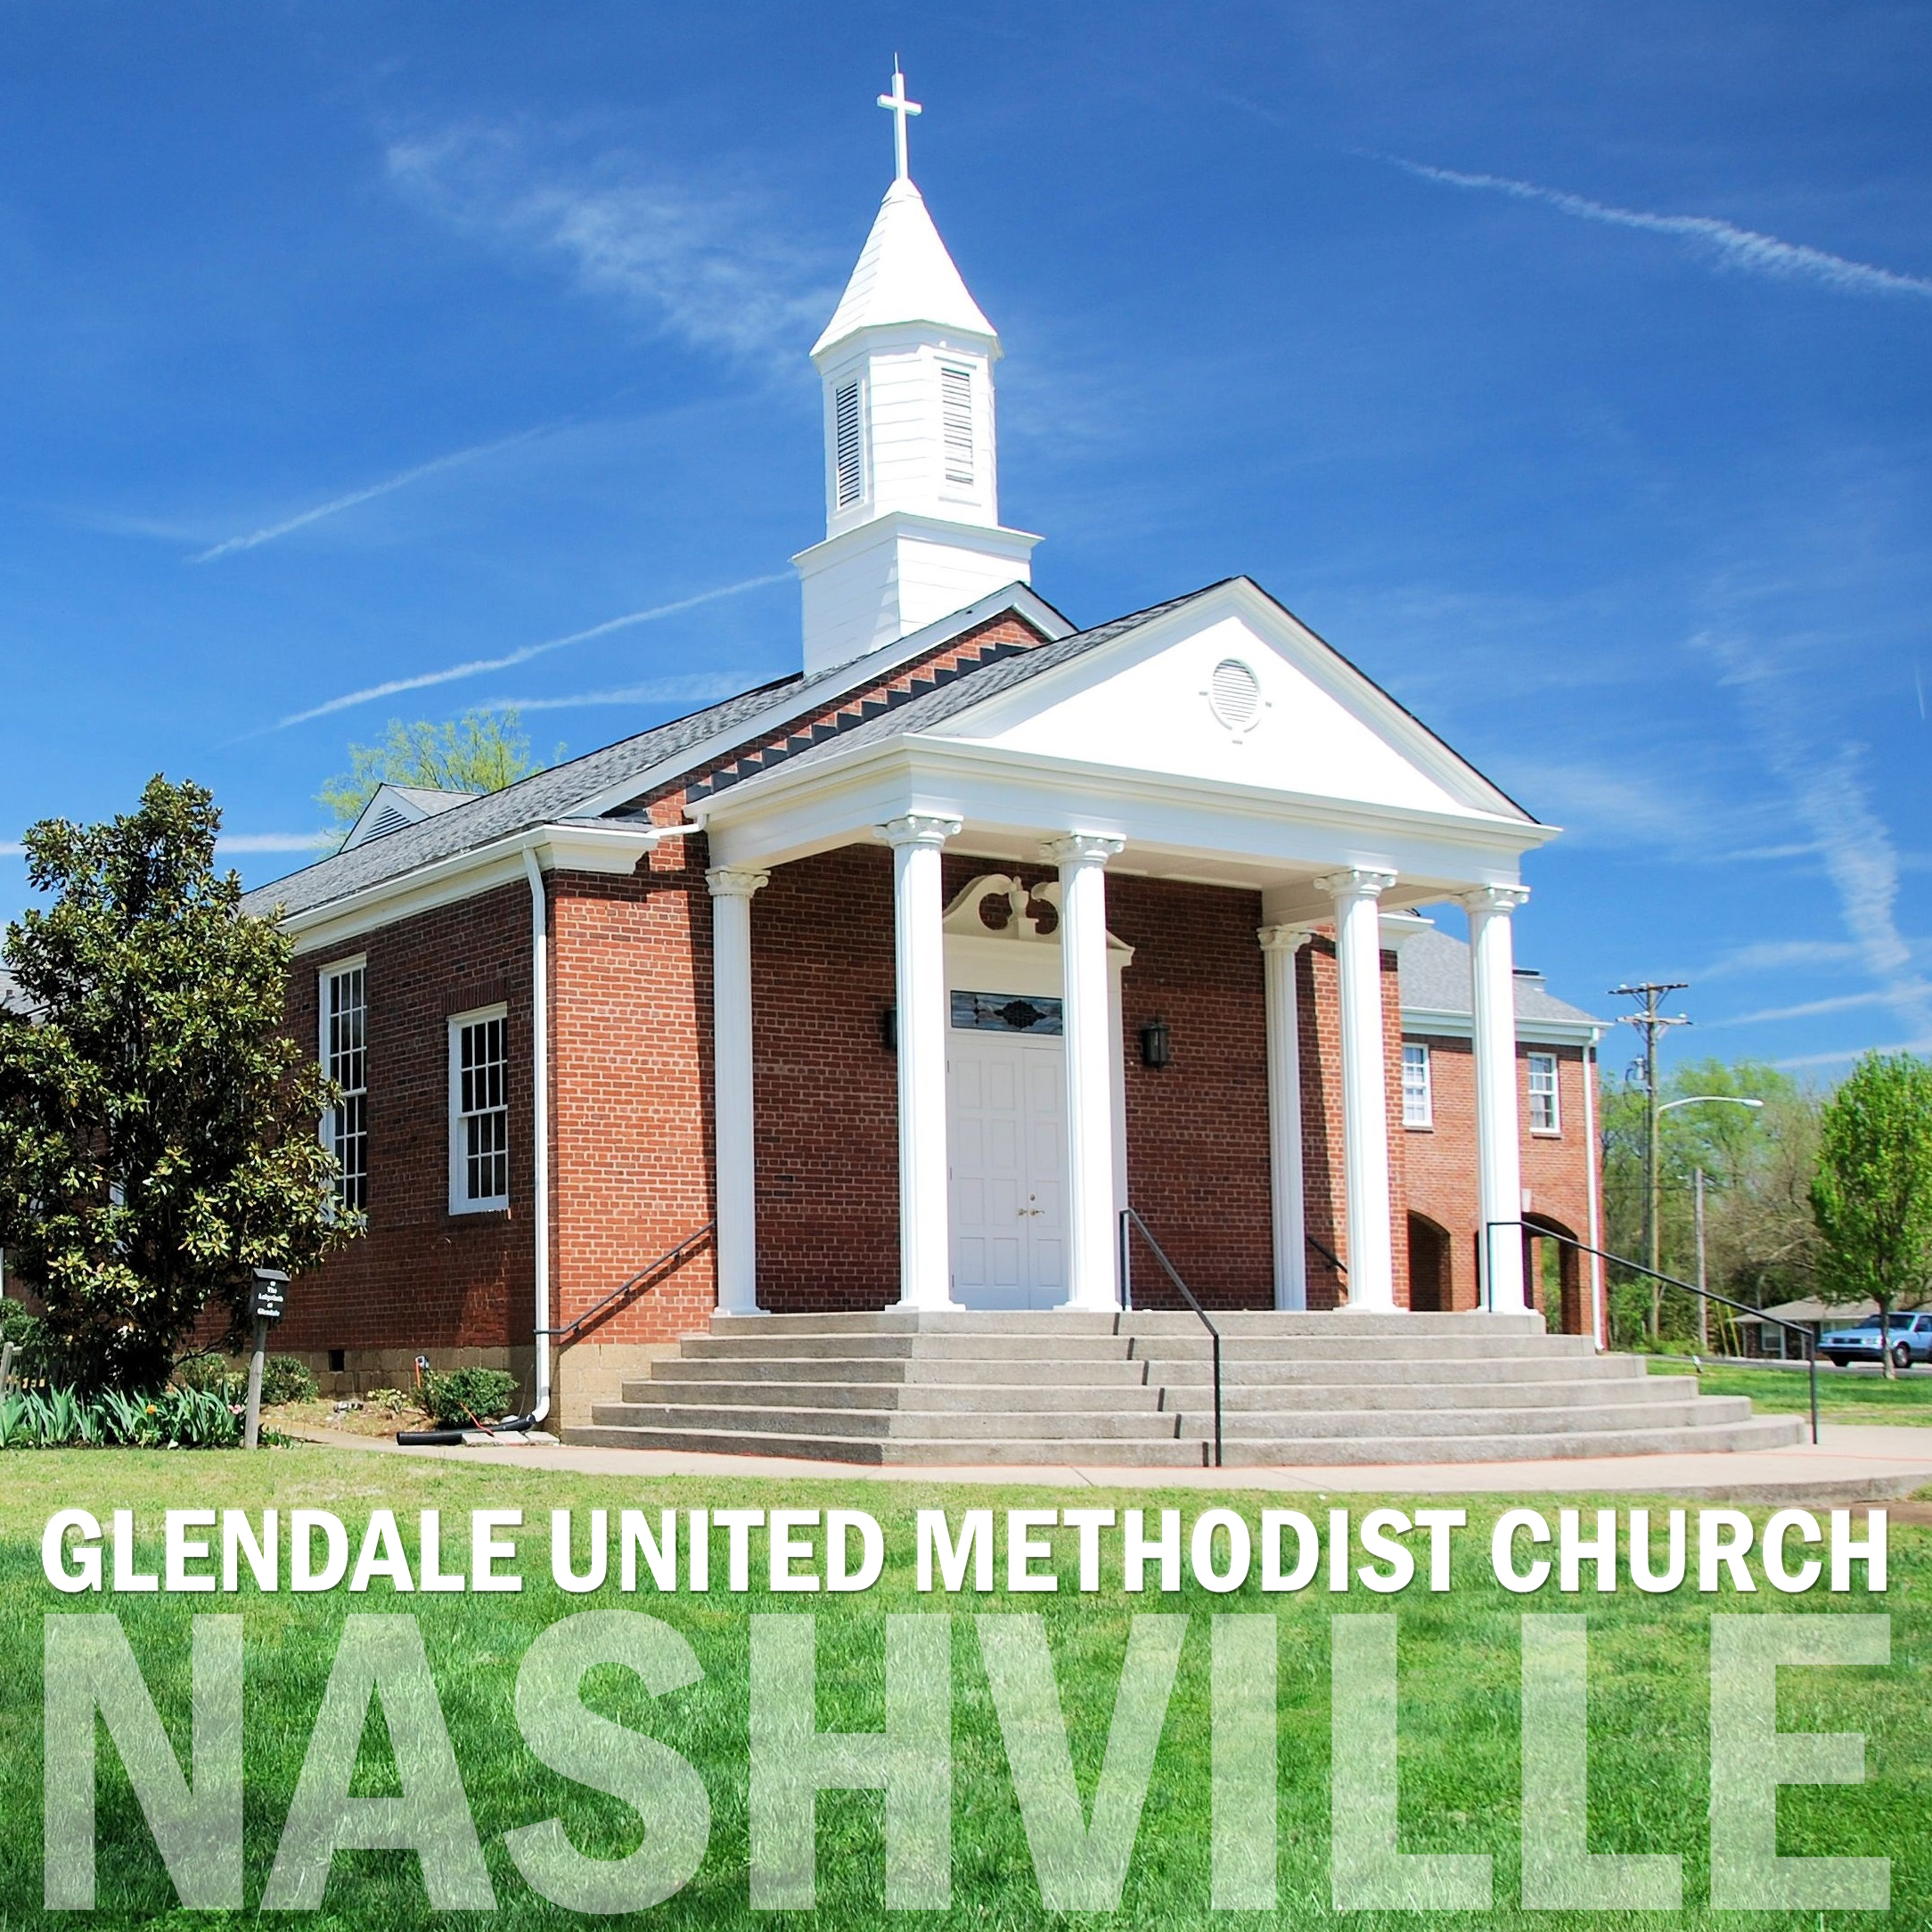 Glendale United Methodist Church Nashville TN